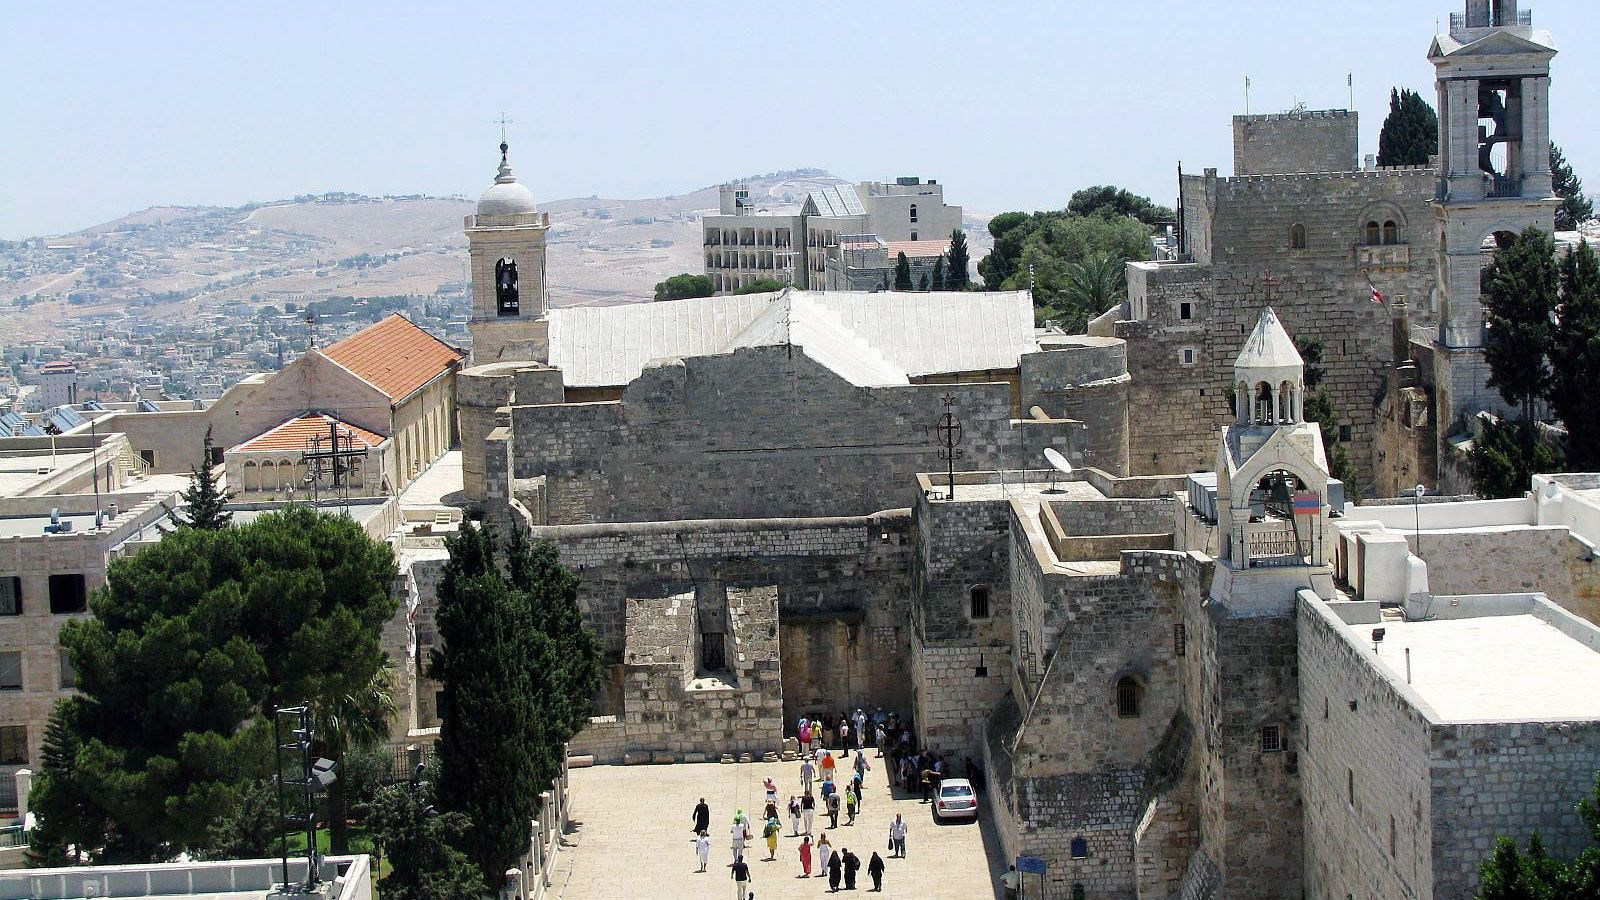 Churches in Bethlehem